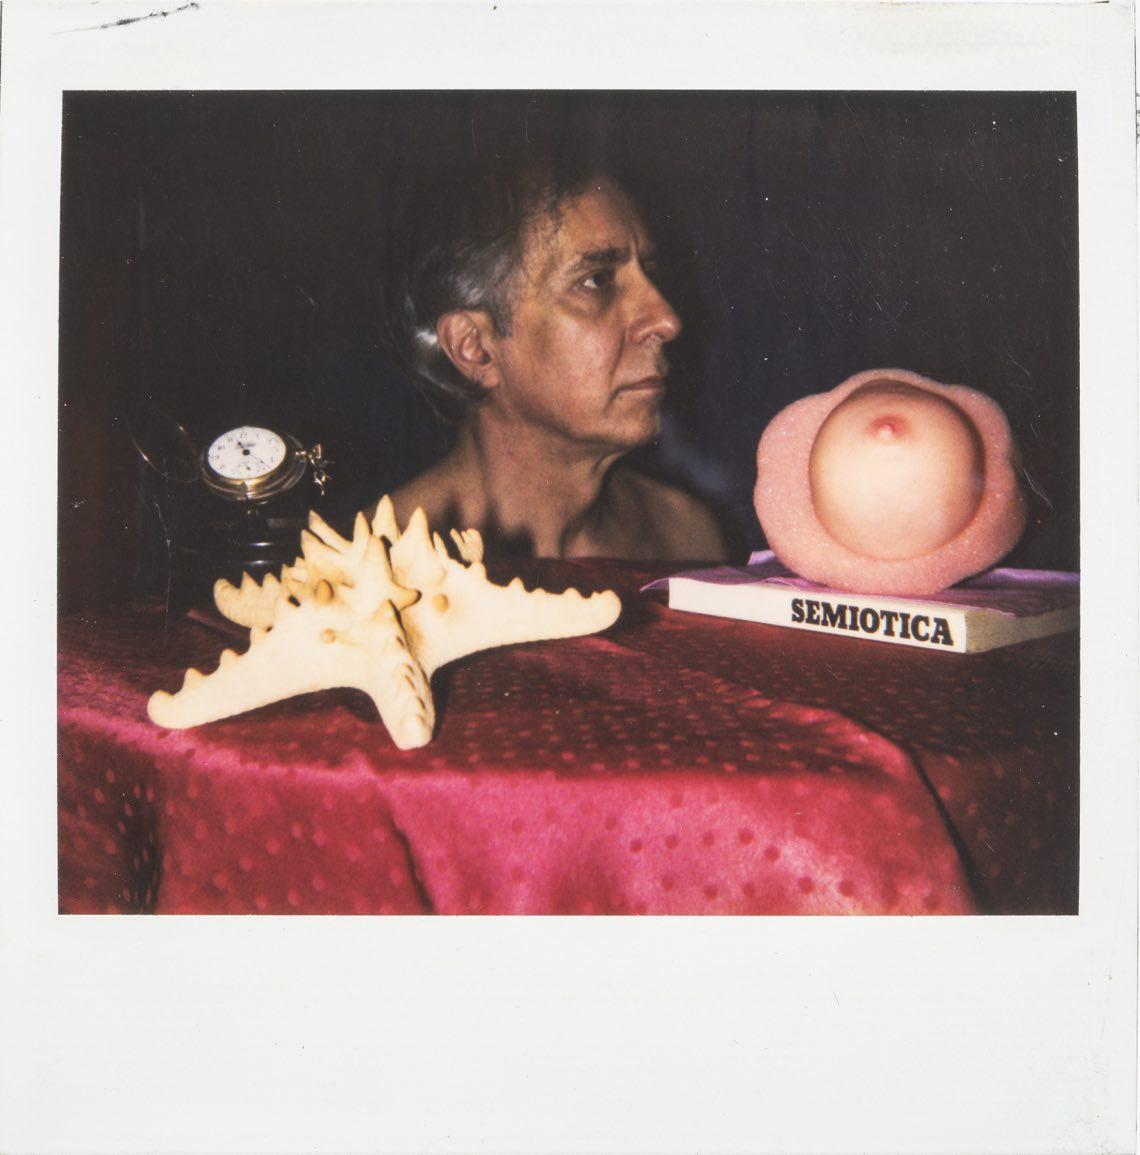 Semiopatella, 1989